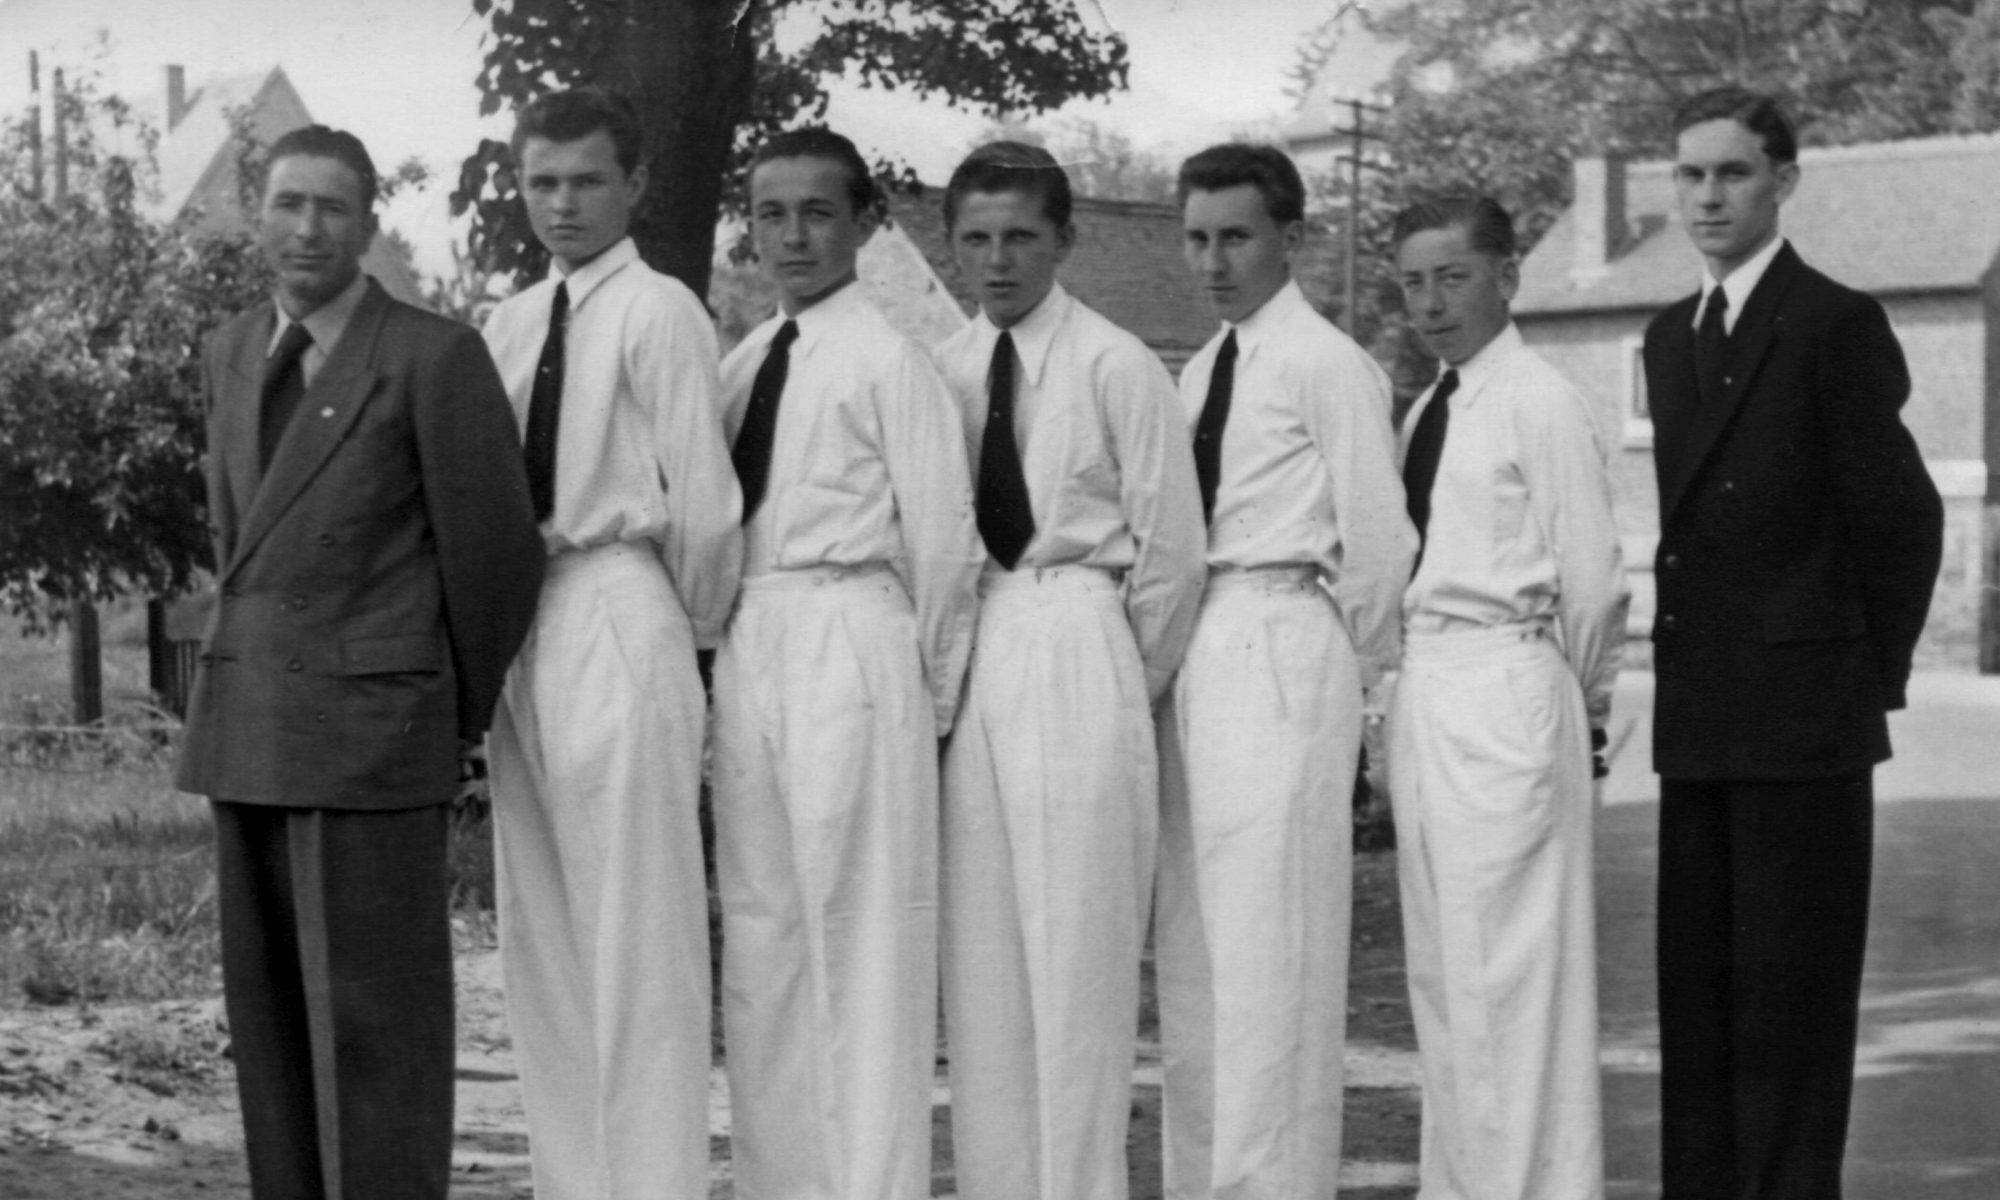 Kegelverein Gemütlichkeit Mömlingen 1950 e.V.